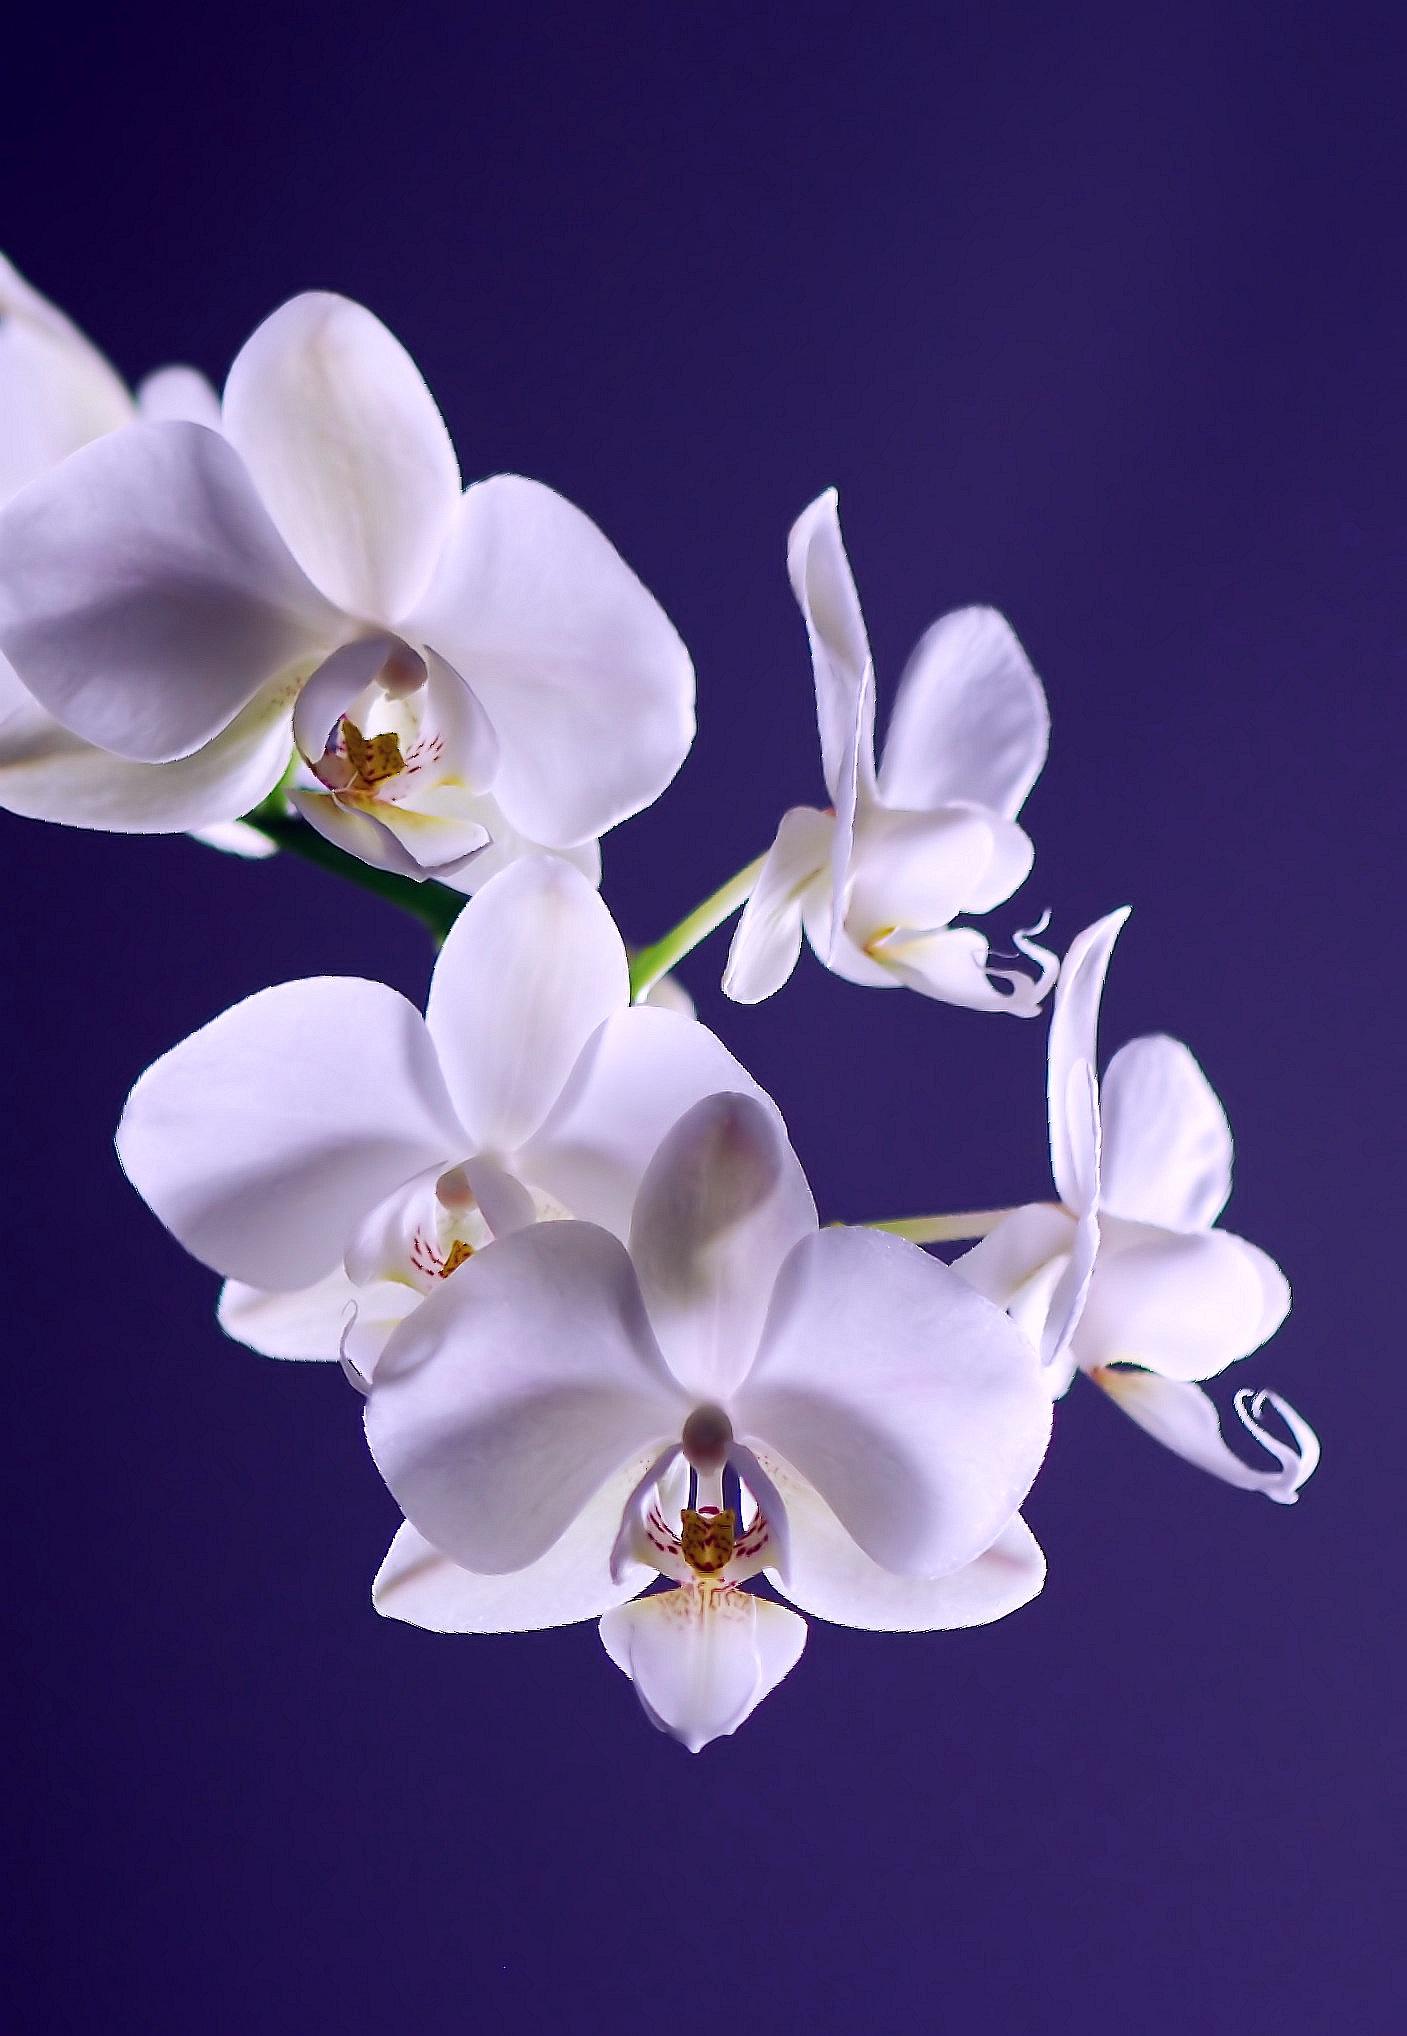 Black Rose Iphone Wallpaper 50 Beautiful Orchid Photos 183 Pexels 183 Free Stock Photos